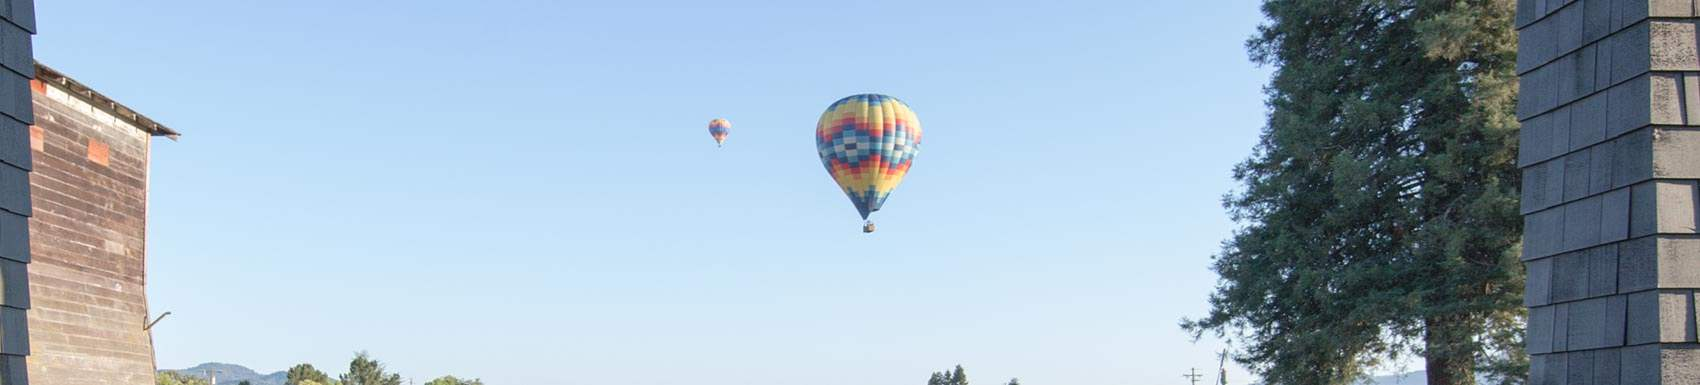 Experience Hot Air Balloon Ride in Napa